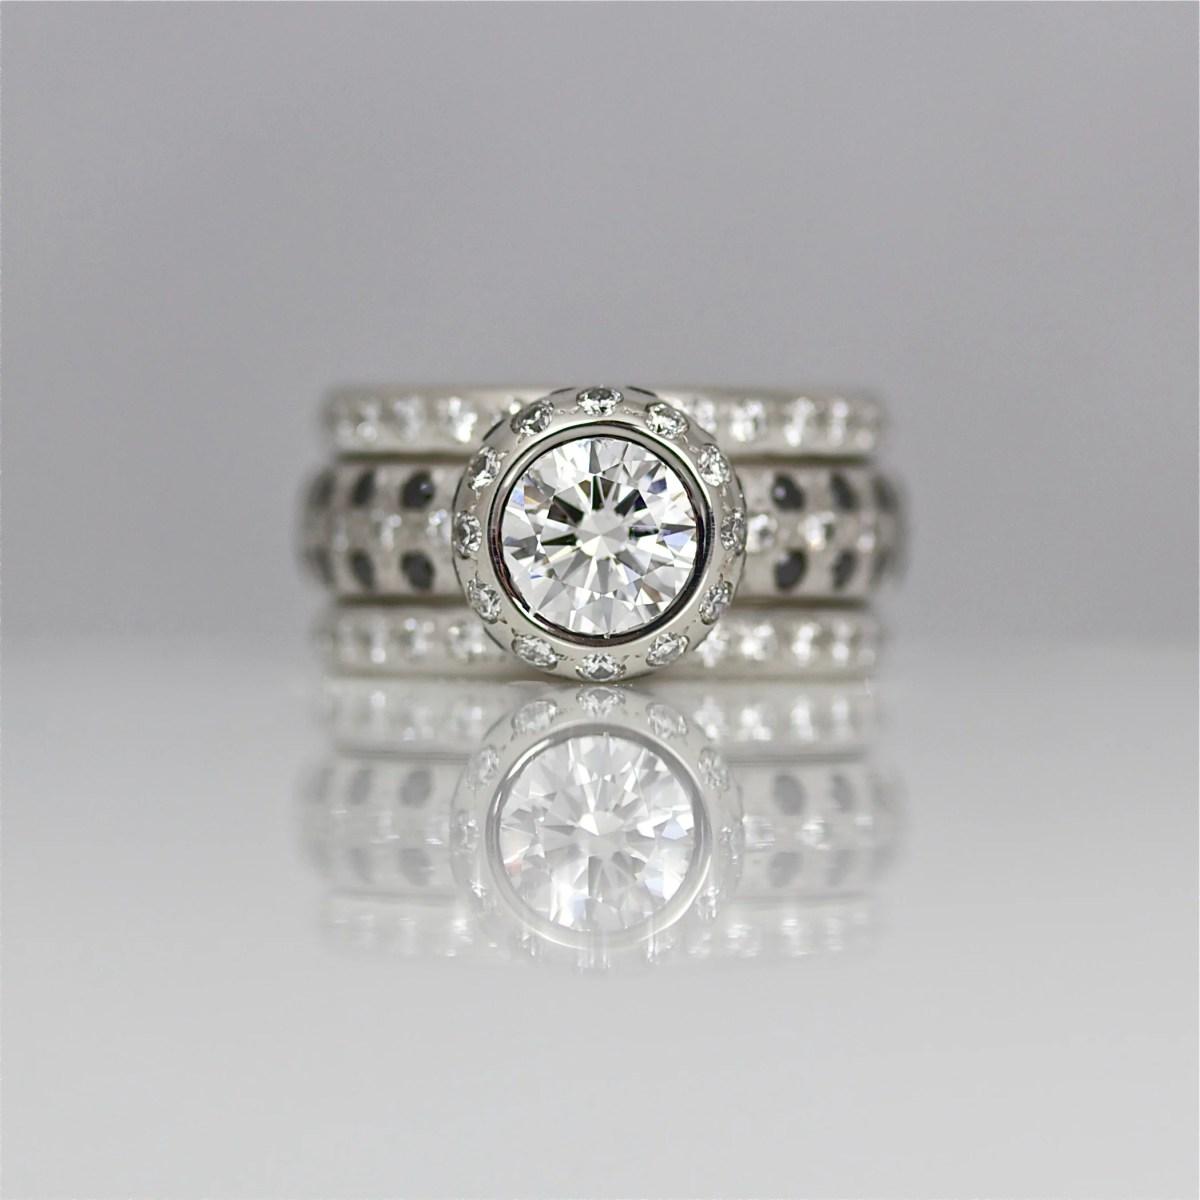 rub-over set diamond ring